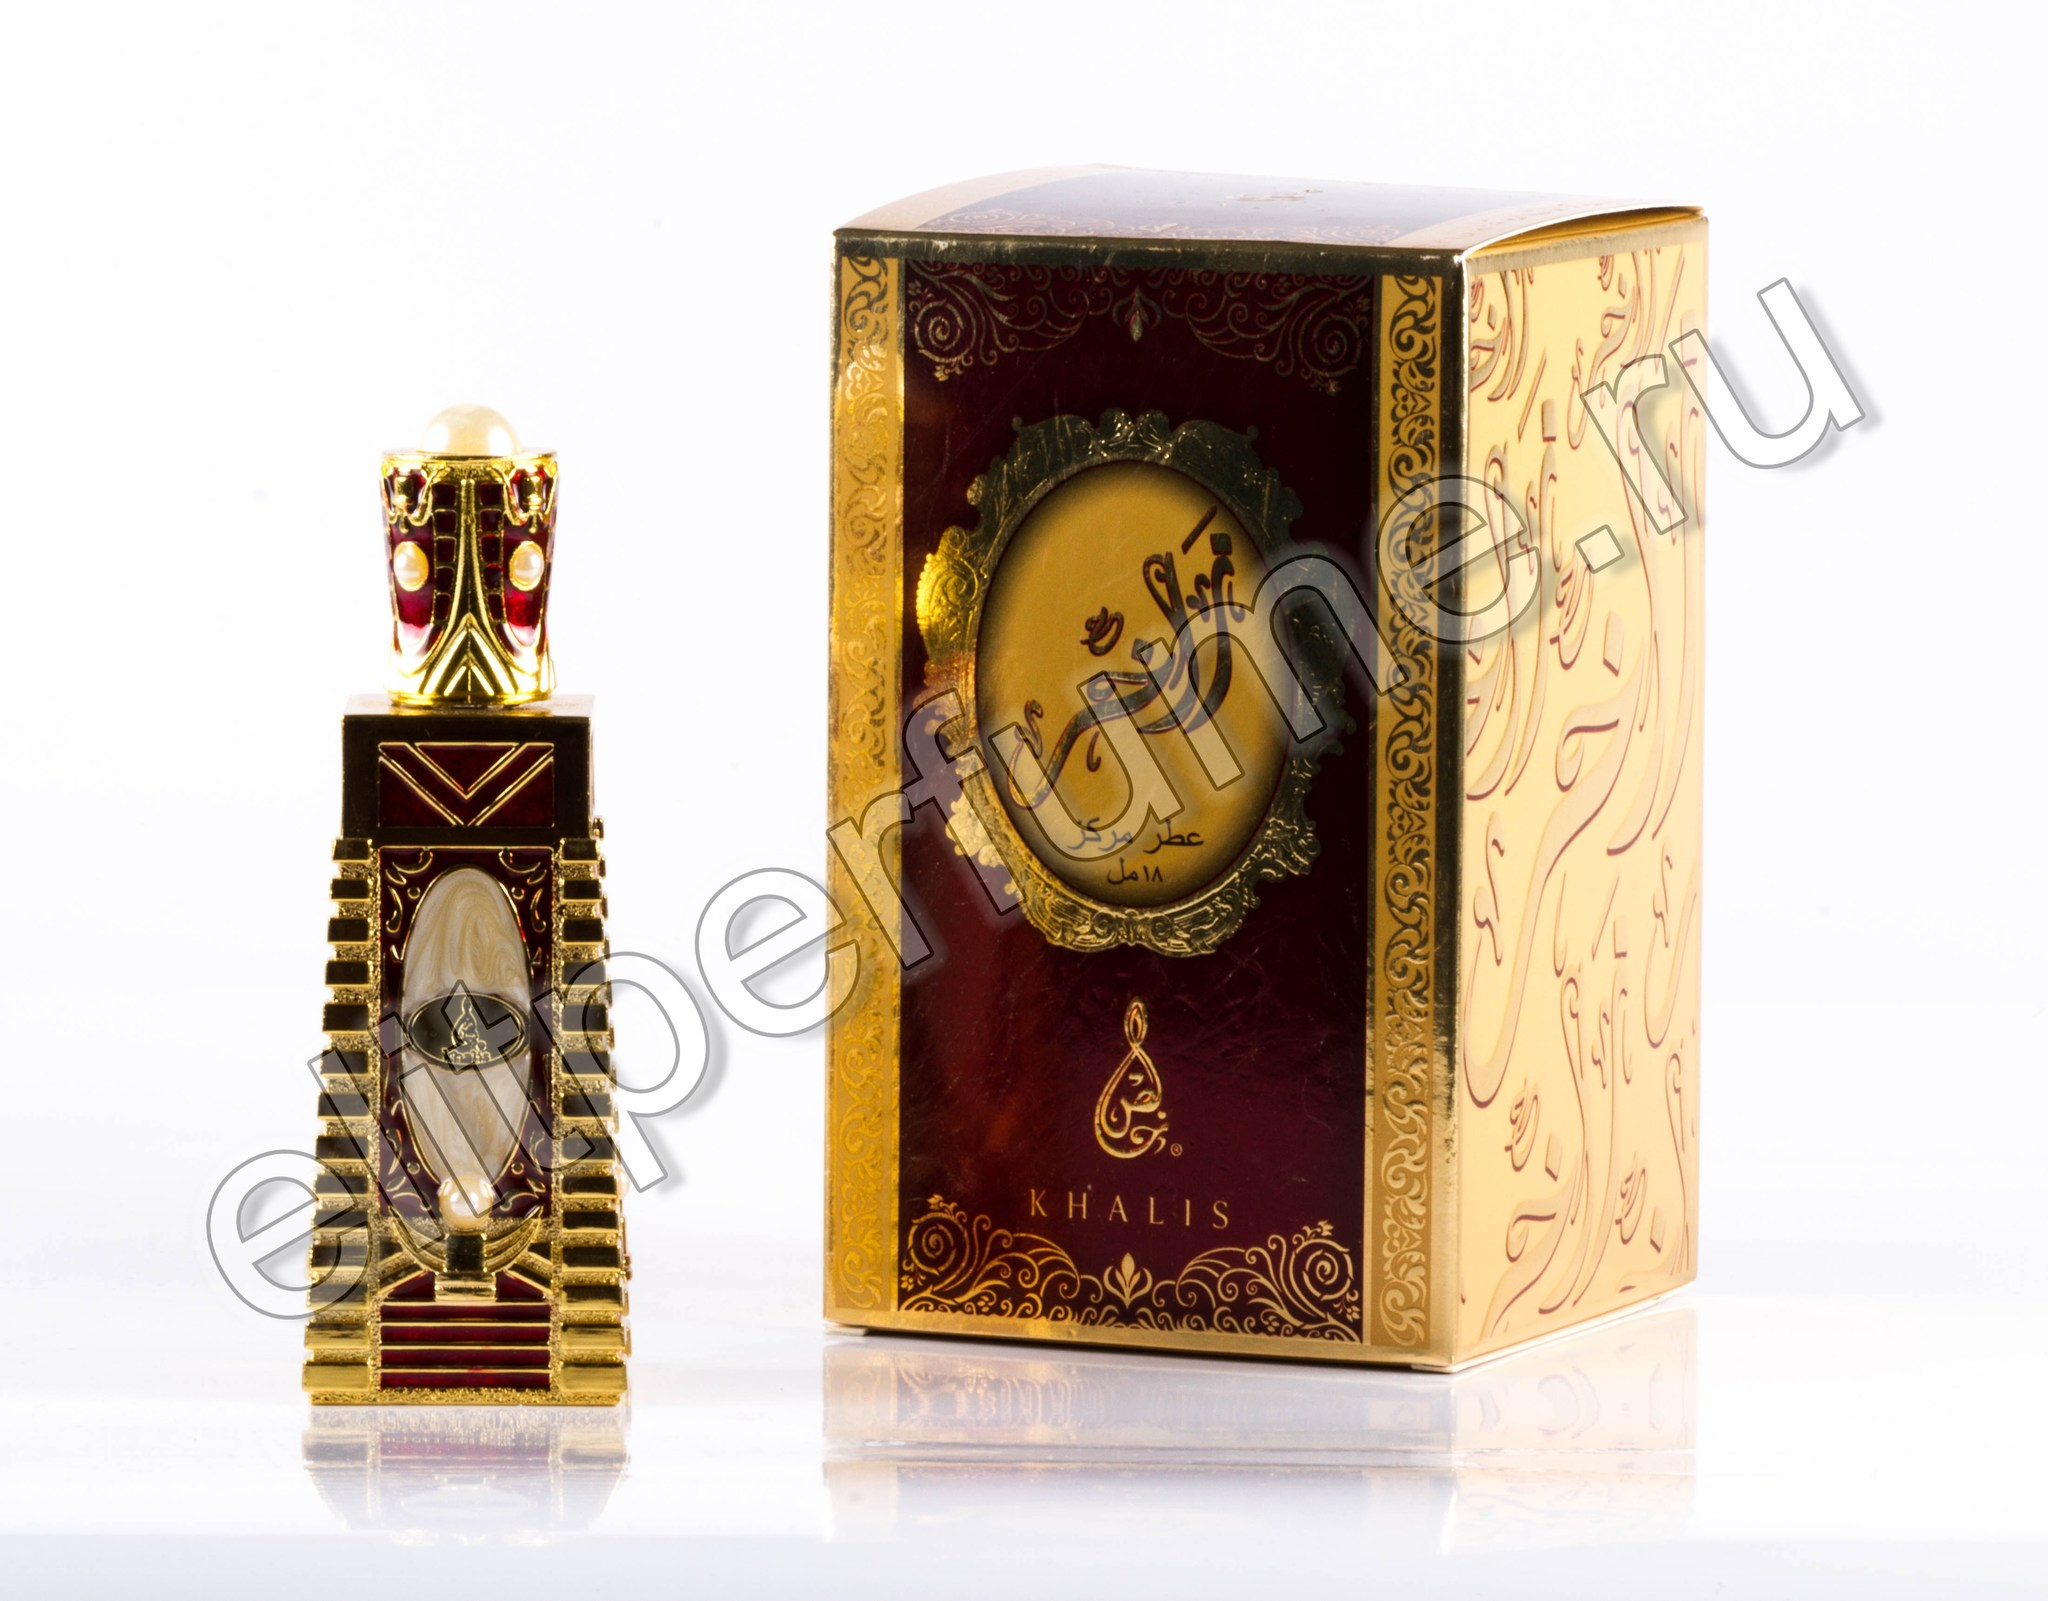 Zakhir Захир 18 мл арабские масляные духи от Халис Khalis Perfumes